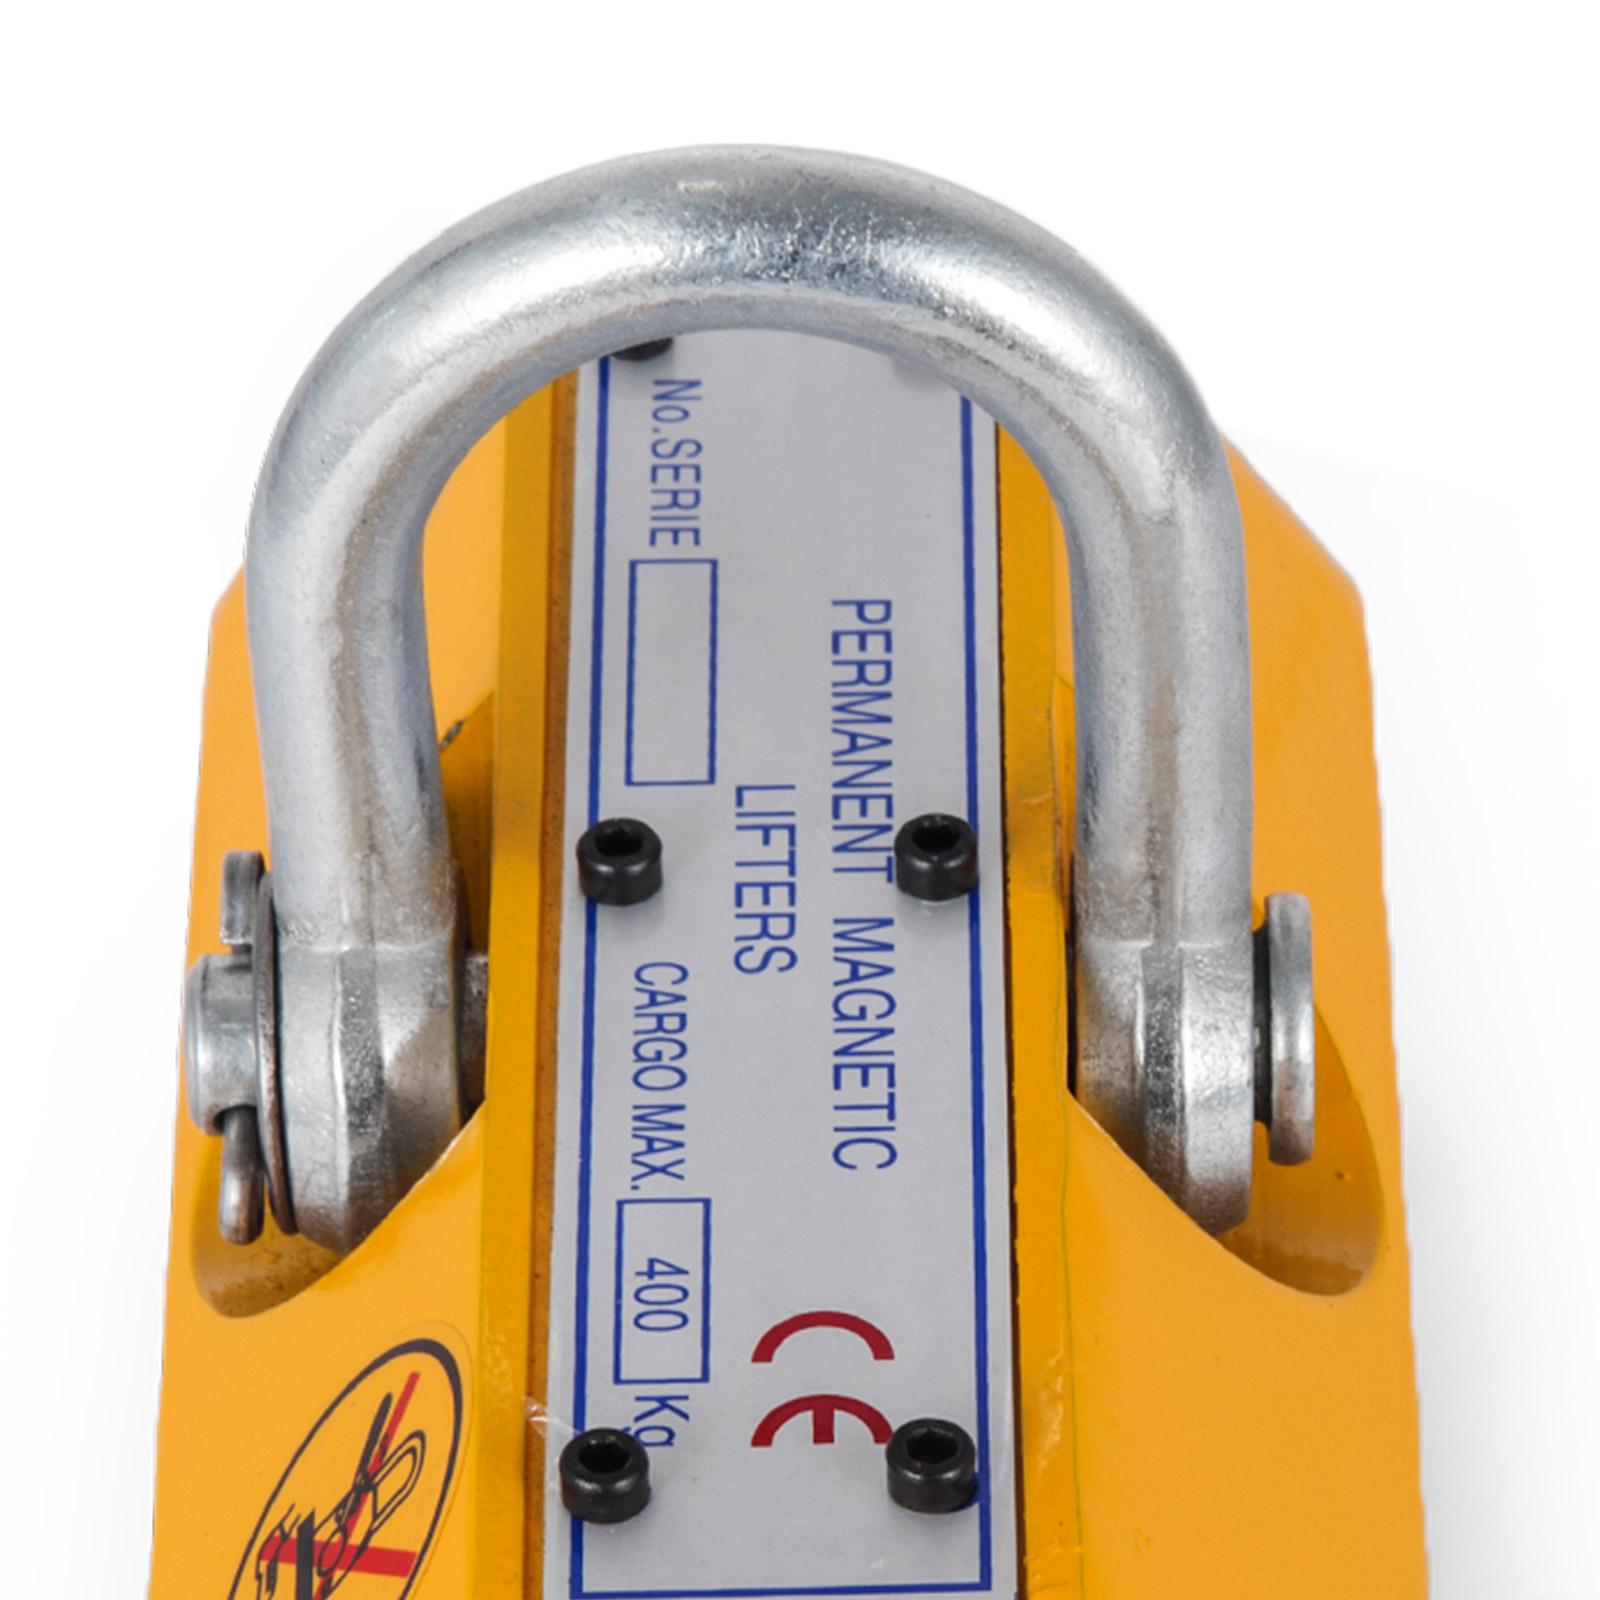 100-300-600-1000KG-Steel-Magnetic-Lifter-Heavy-Duty-Crane-Hoist-Lifting-Magnet miniature 44